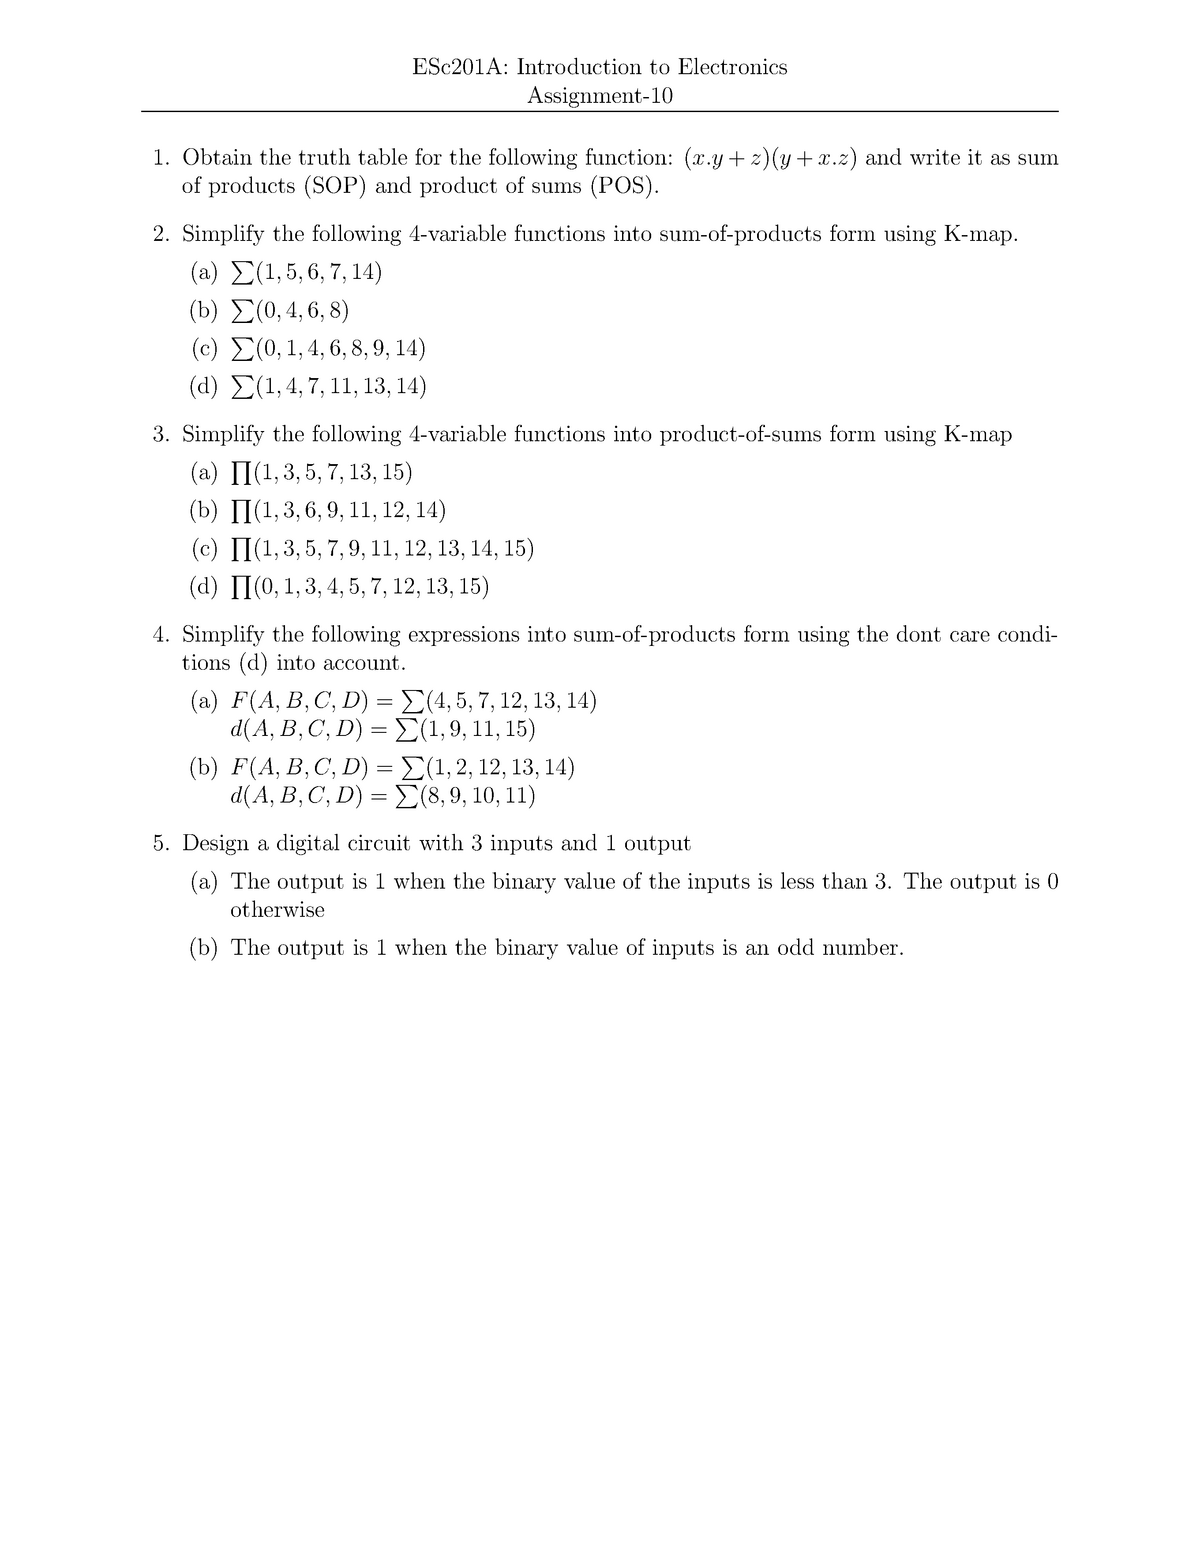 Assign 10 - ESC201: Introduction To Electronics - StuDocu